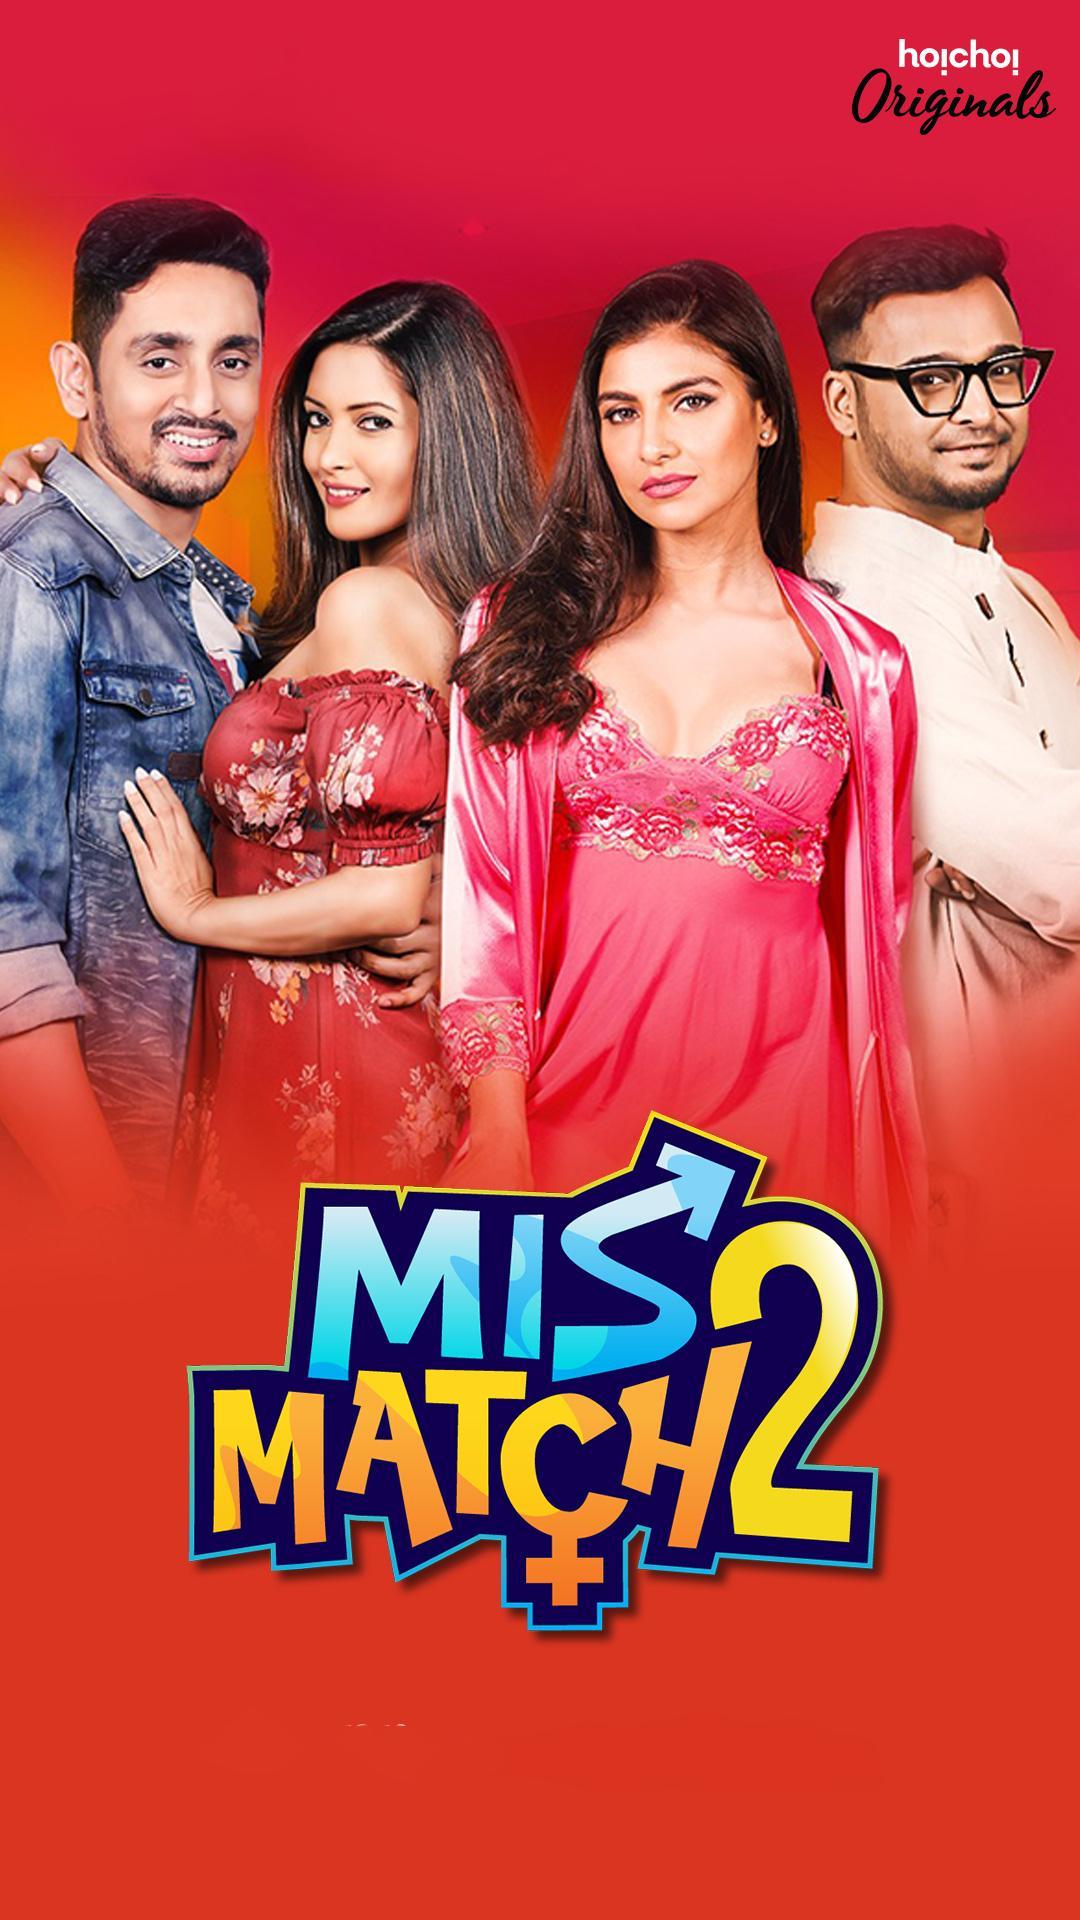 Mismatch (2019) Bengali Full Web Series S2 All EP 480p, 720p,1080p Download